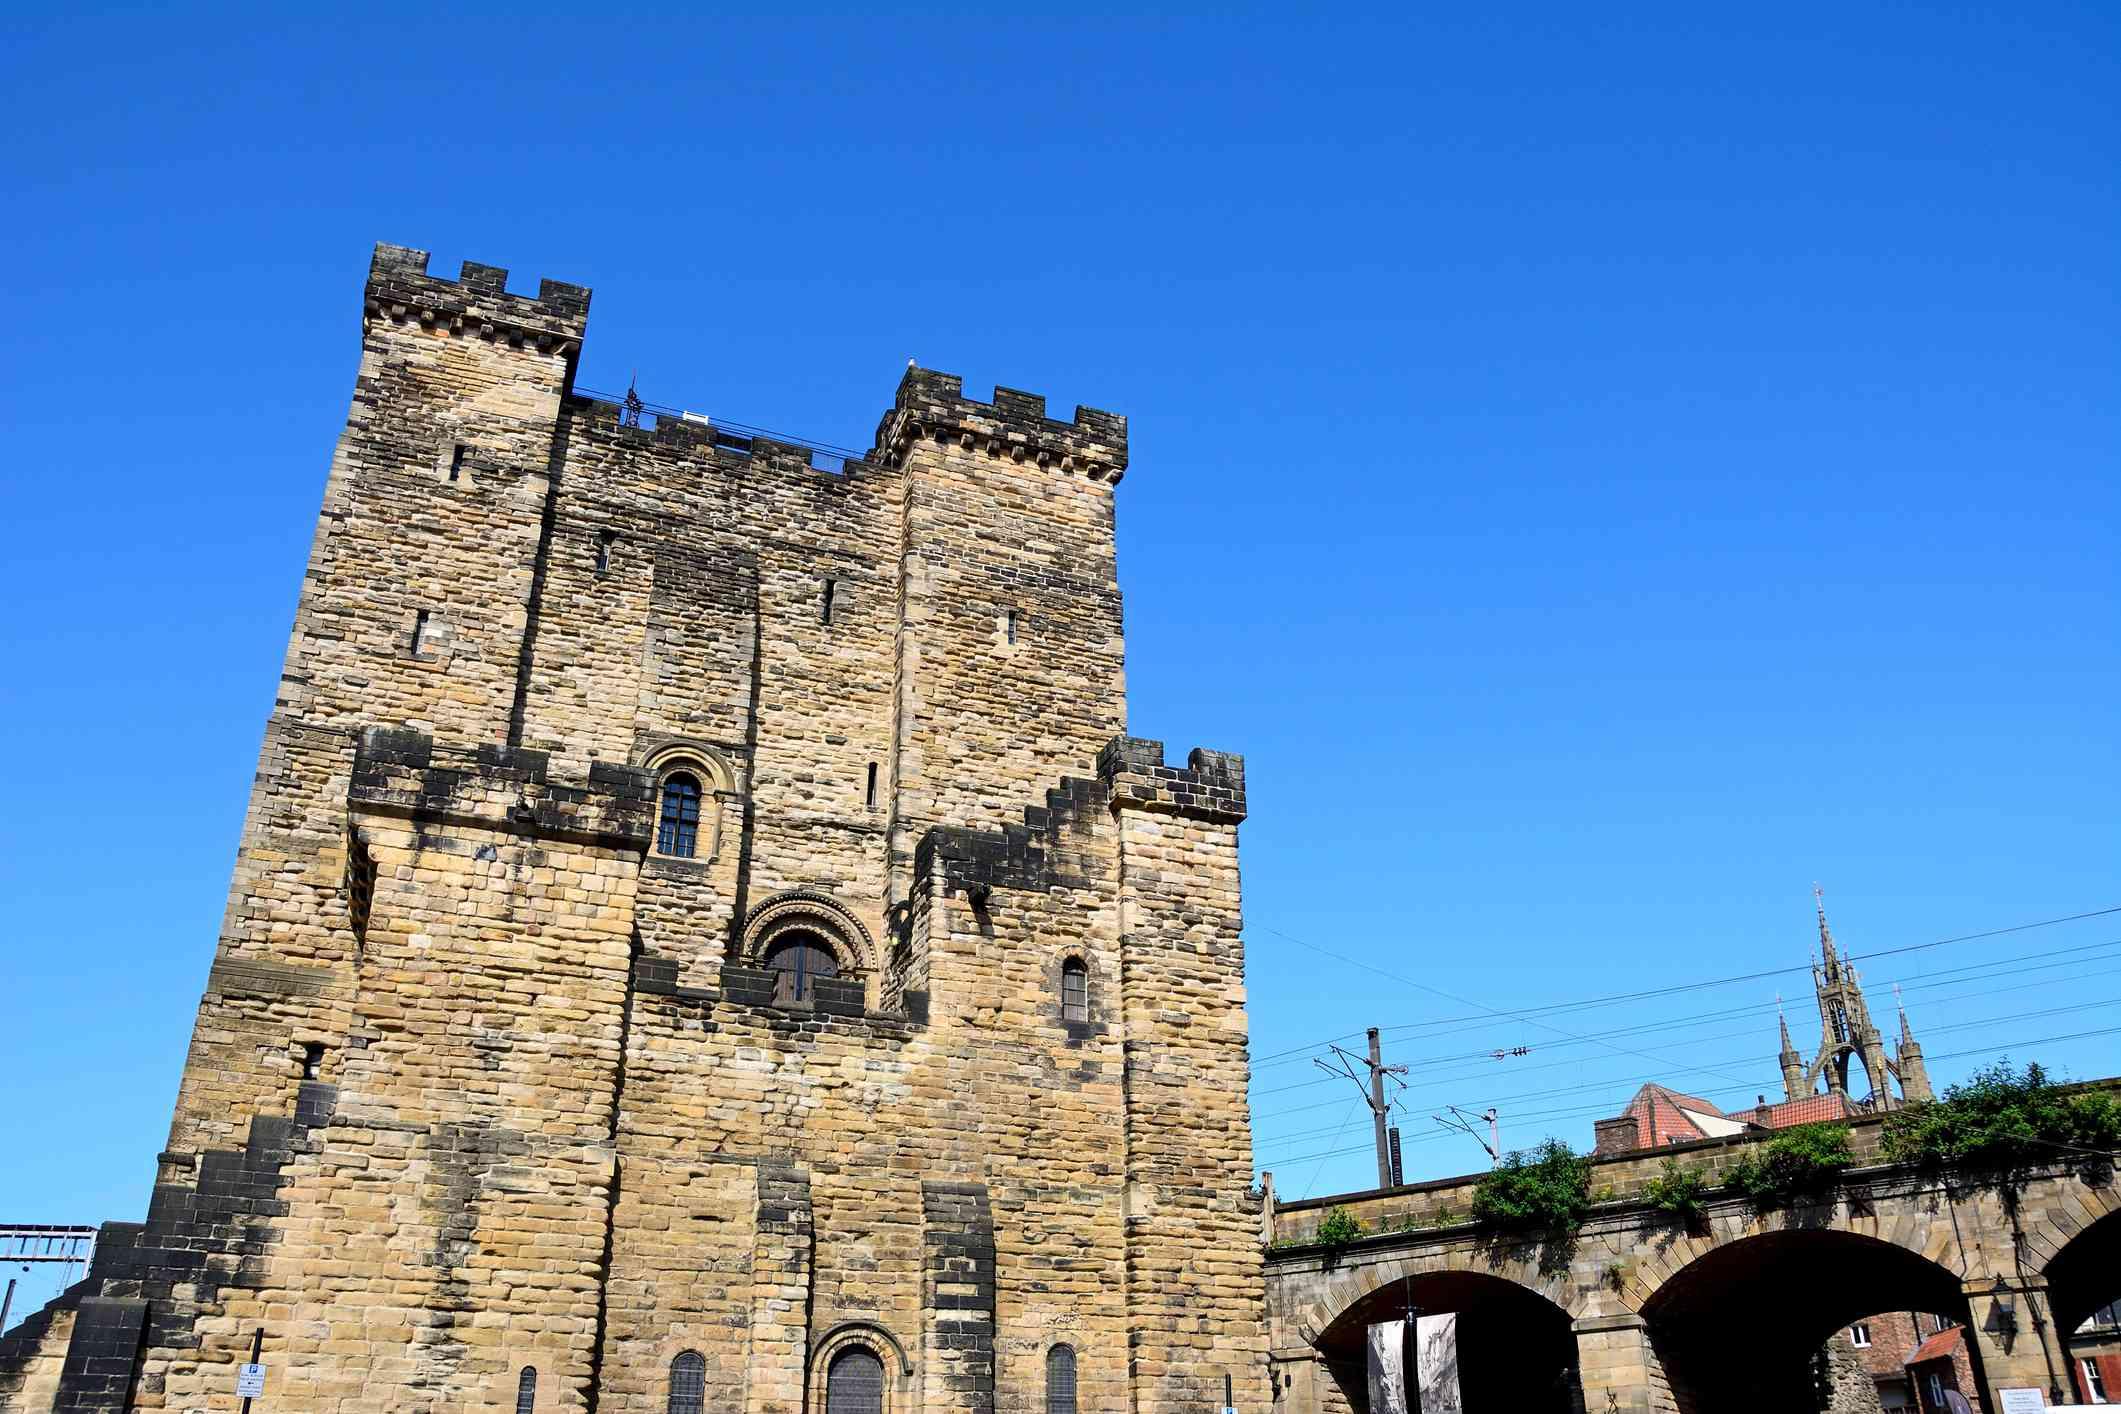 Medieval Castle, Newcastle Upon Tyne, UK.